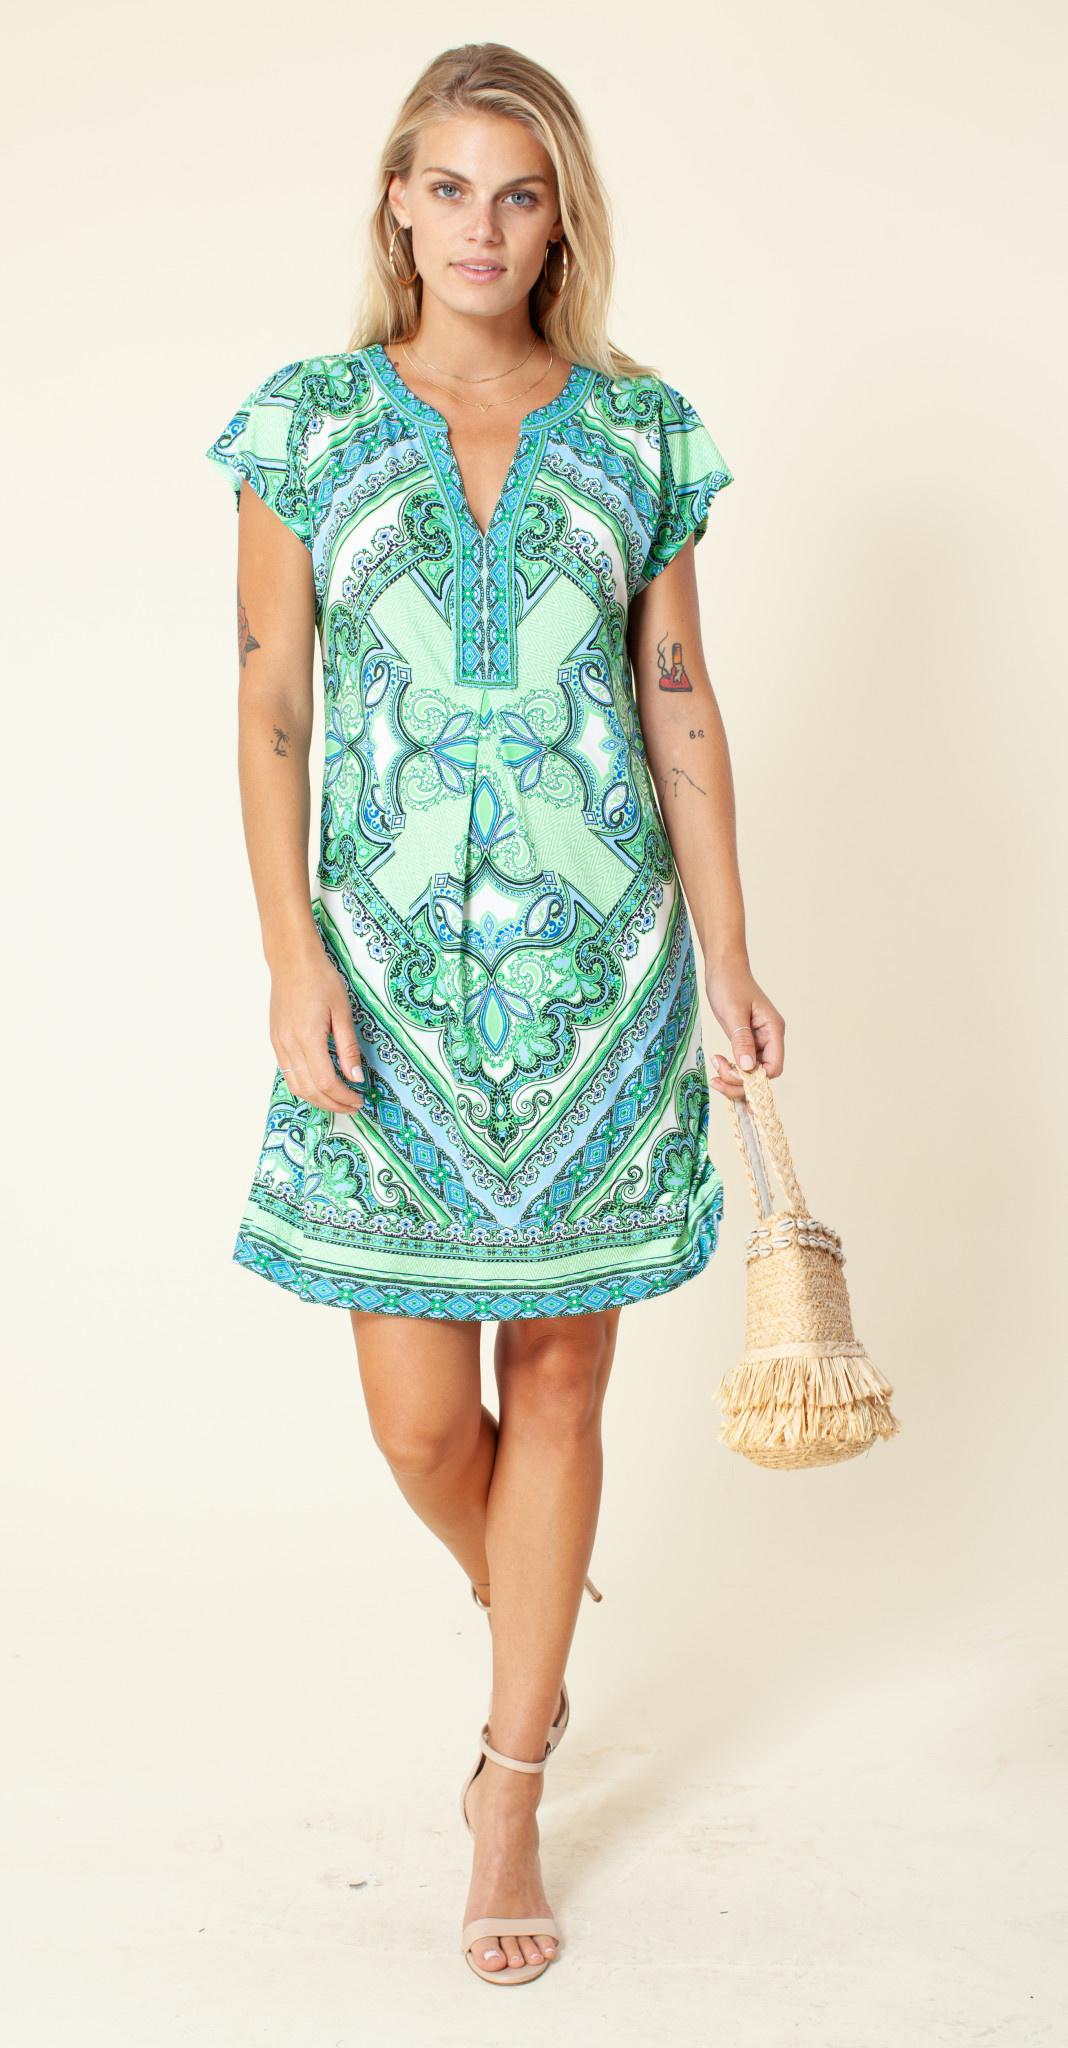 Hale Bob Short Sleeve Dress Lime